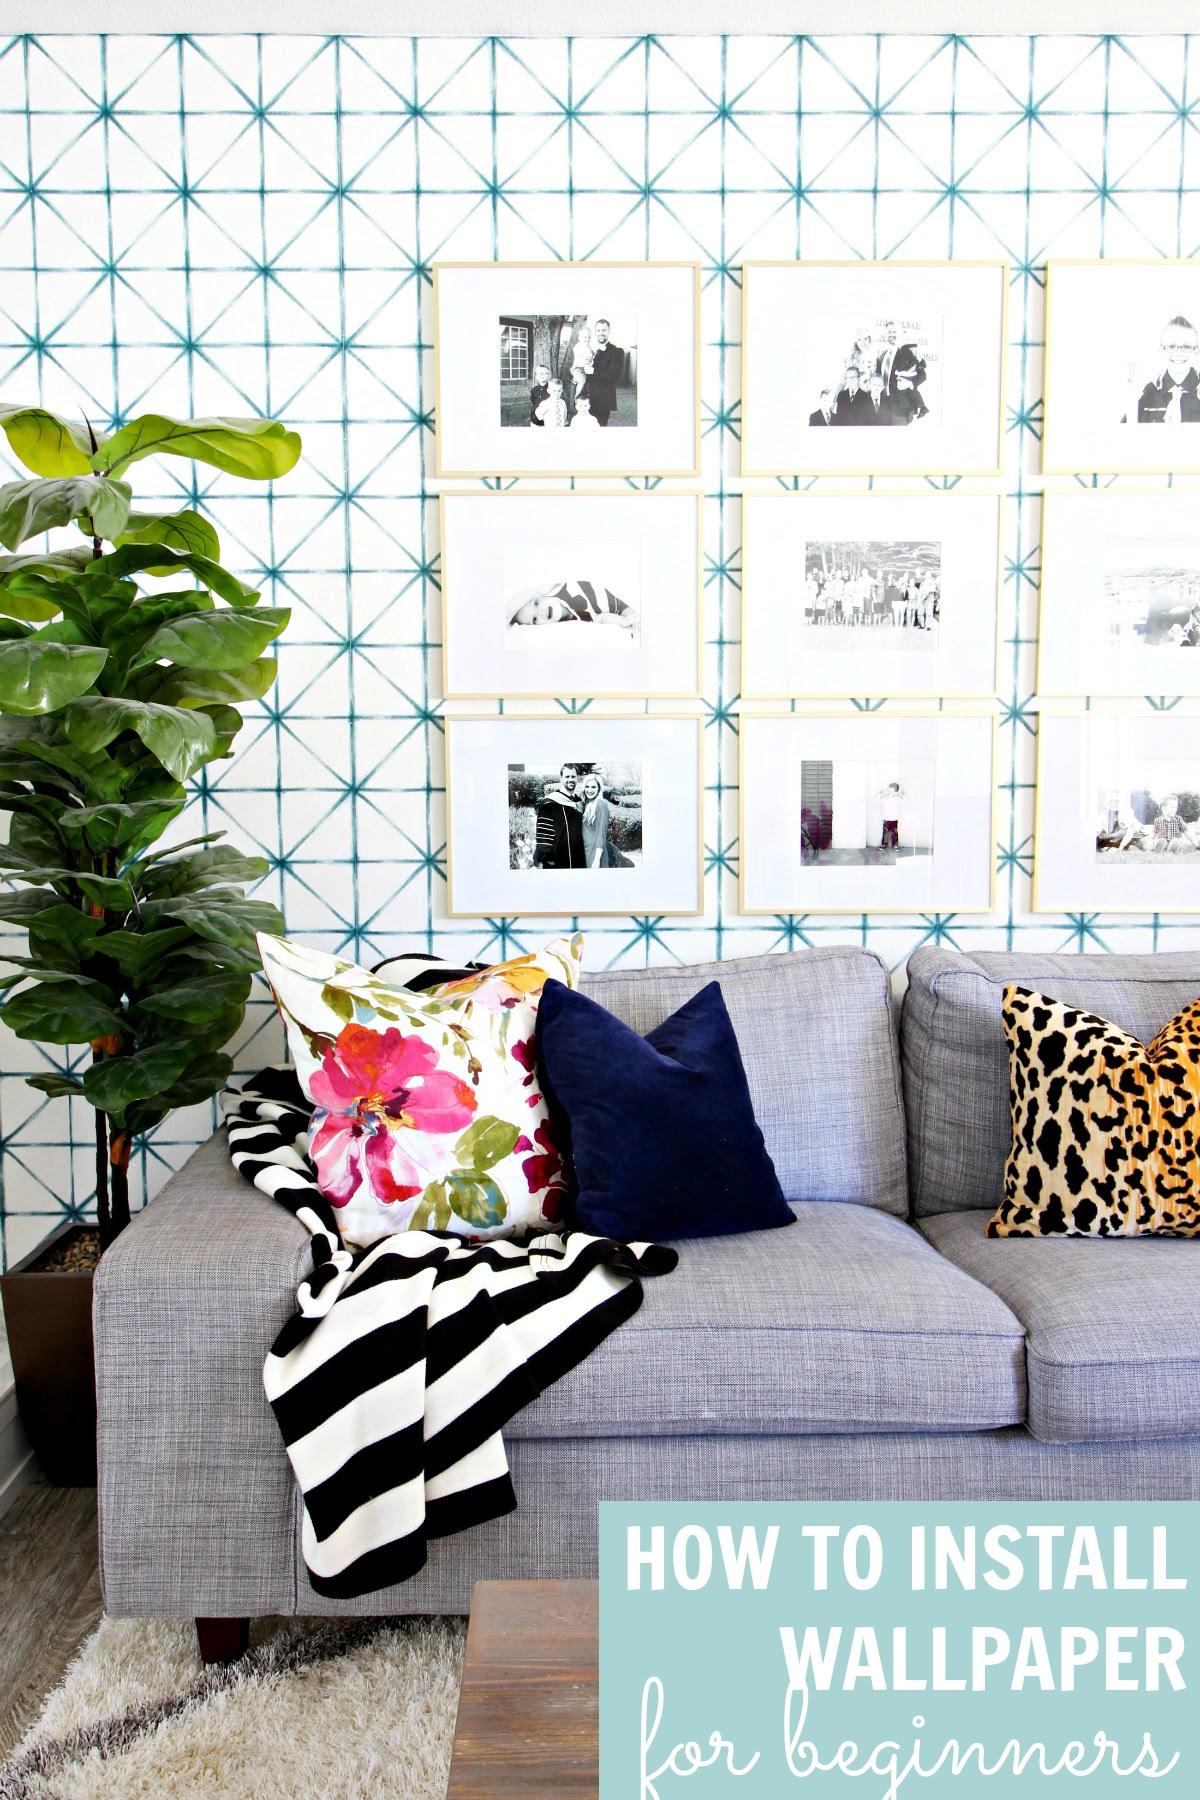 Prescott View Home Reno: How to install wallpaper  Classy Clutter  Bloglovin\u2019